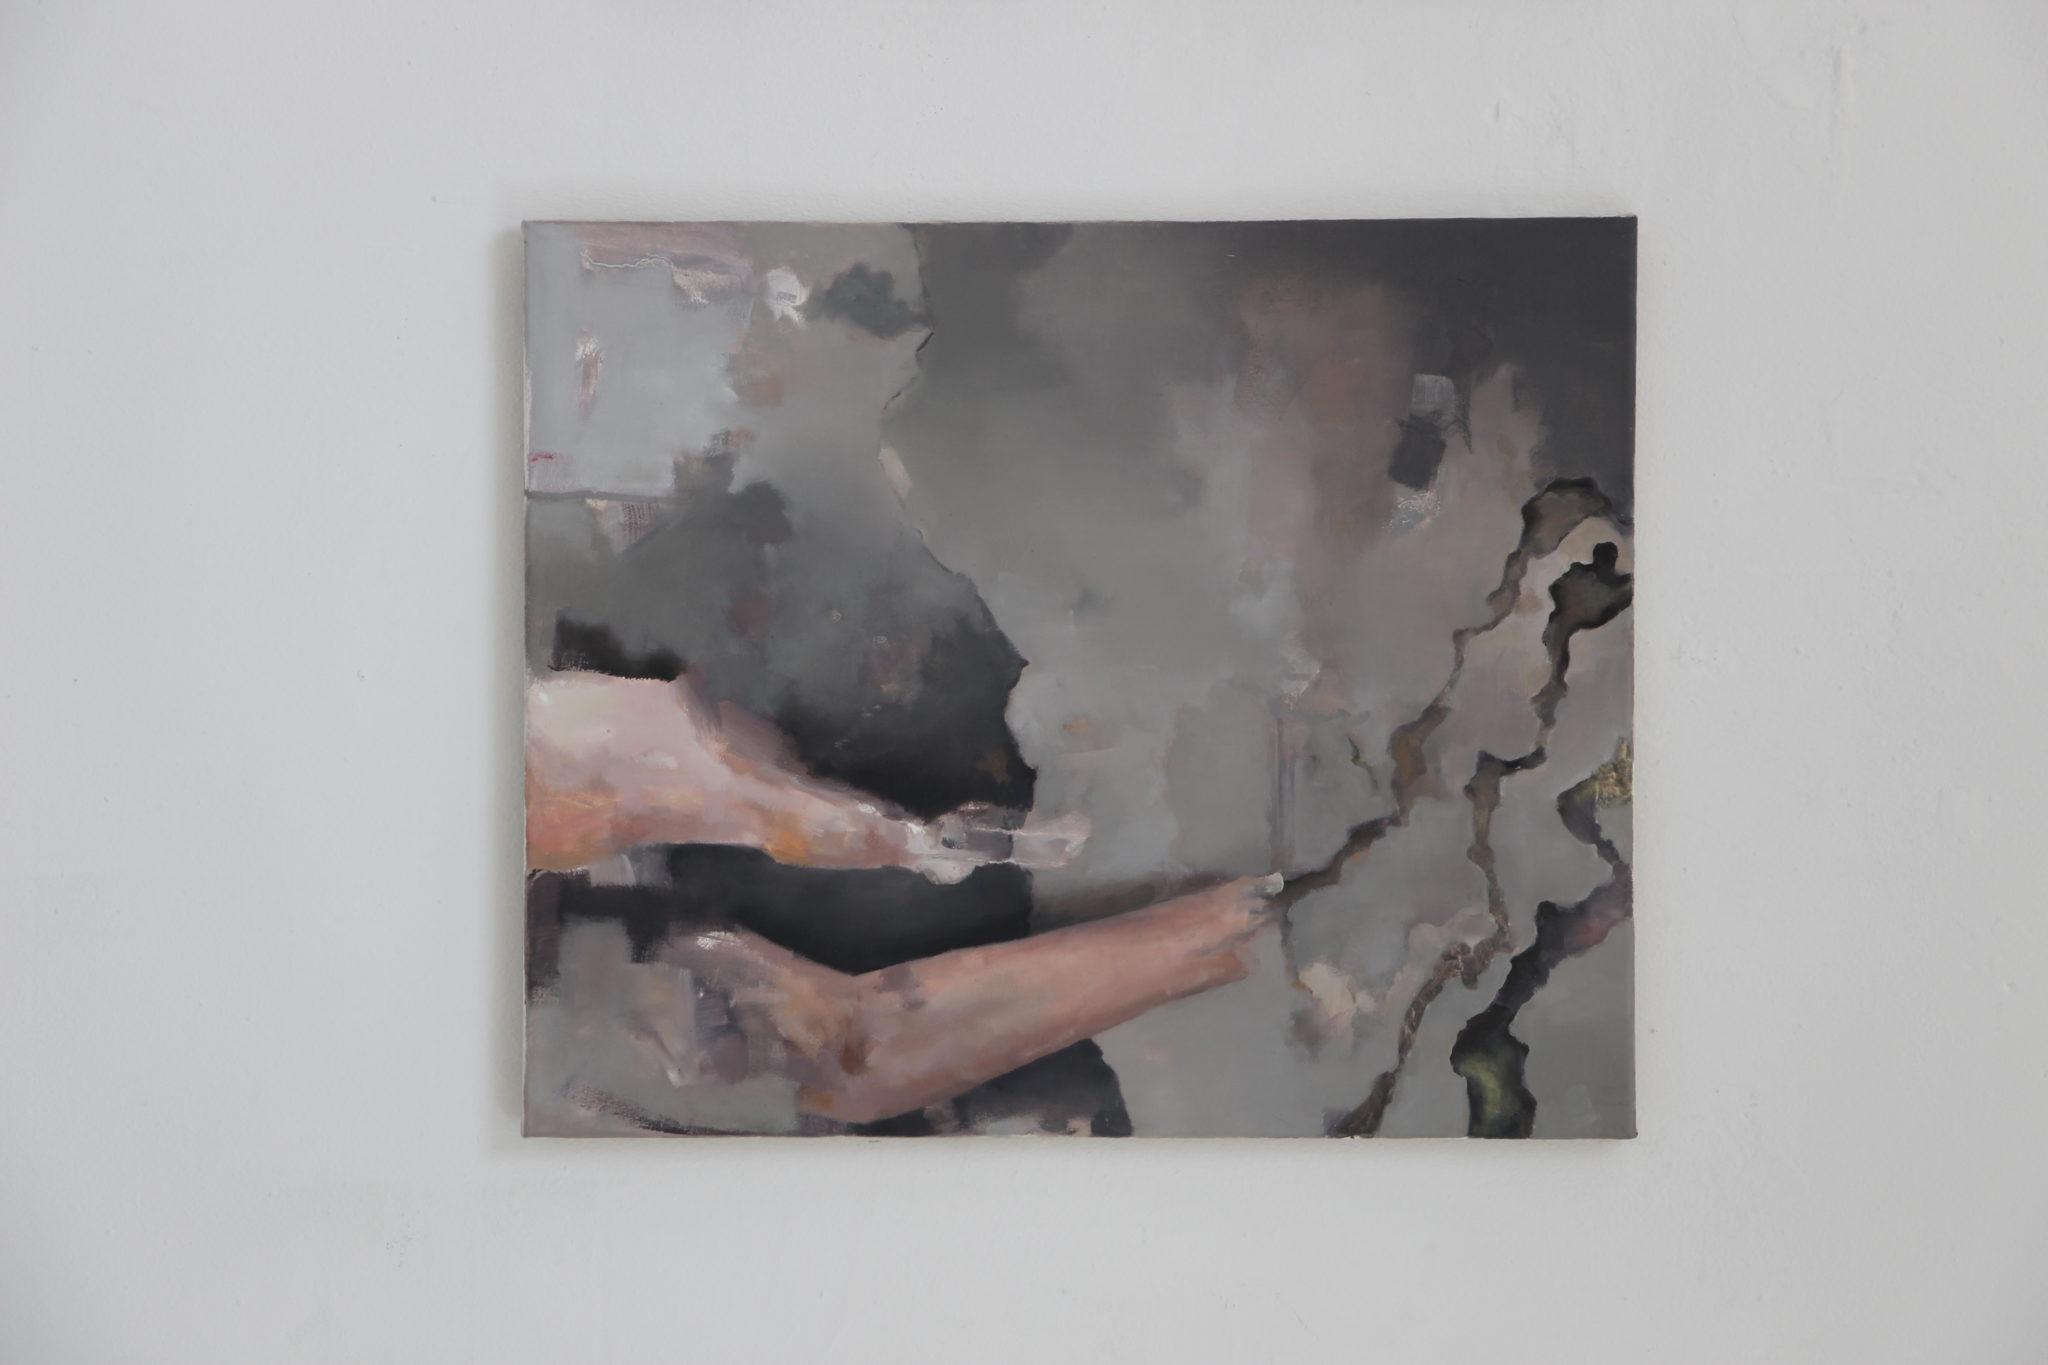 Felix Lorenz, Ohne Titel ( Bild 2), Öl auf Leinwand, 60x50, 2020